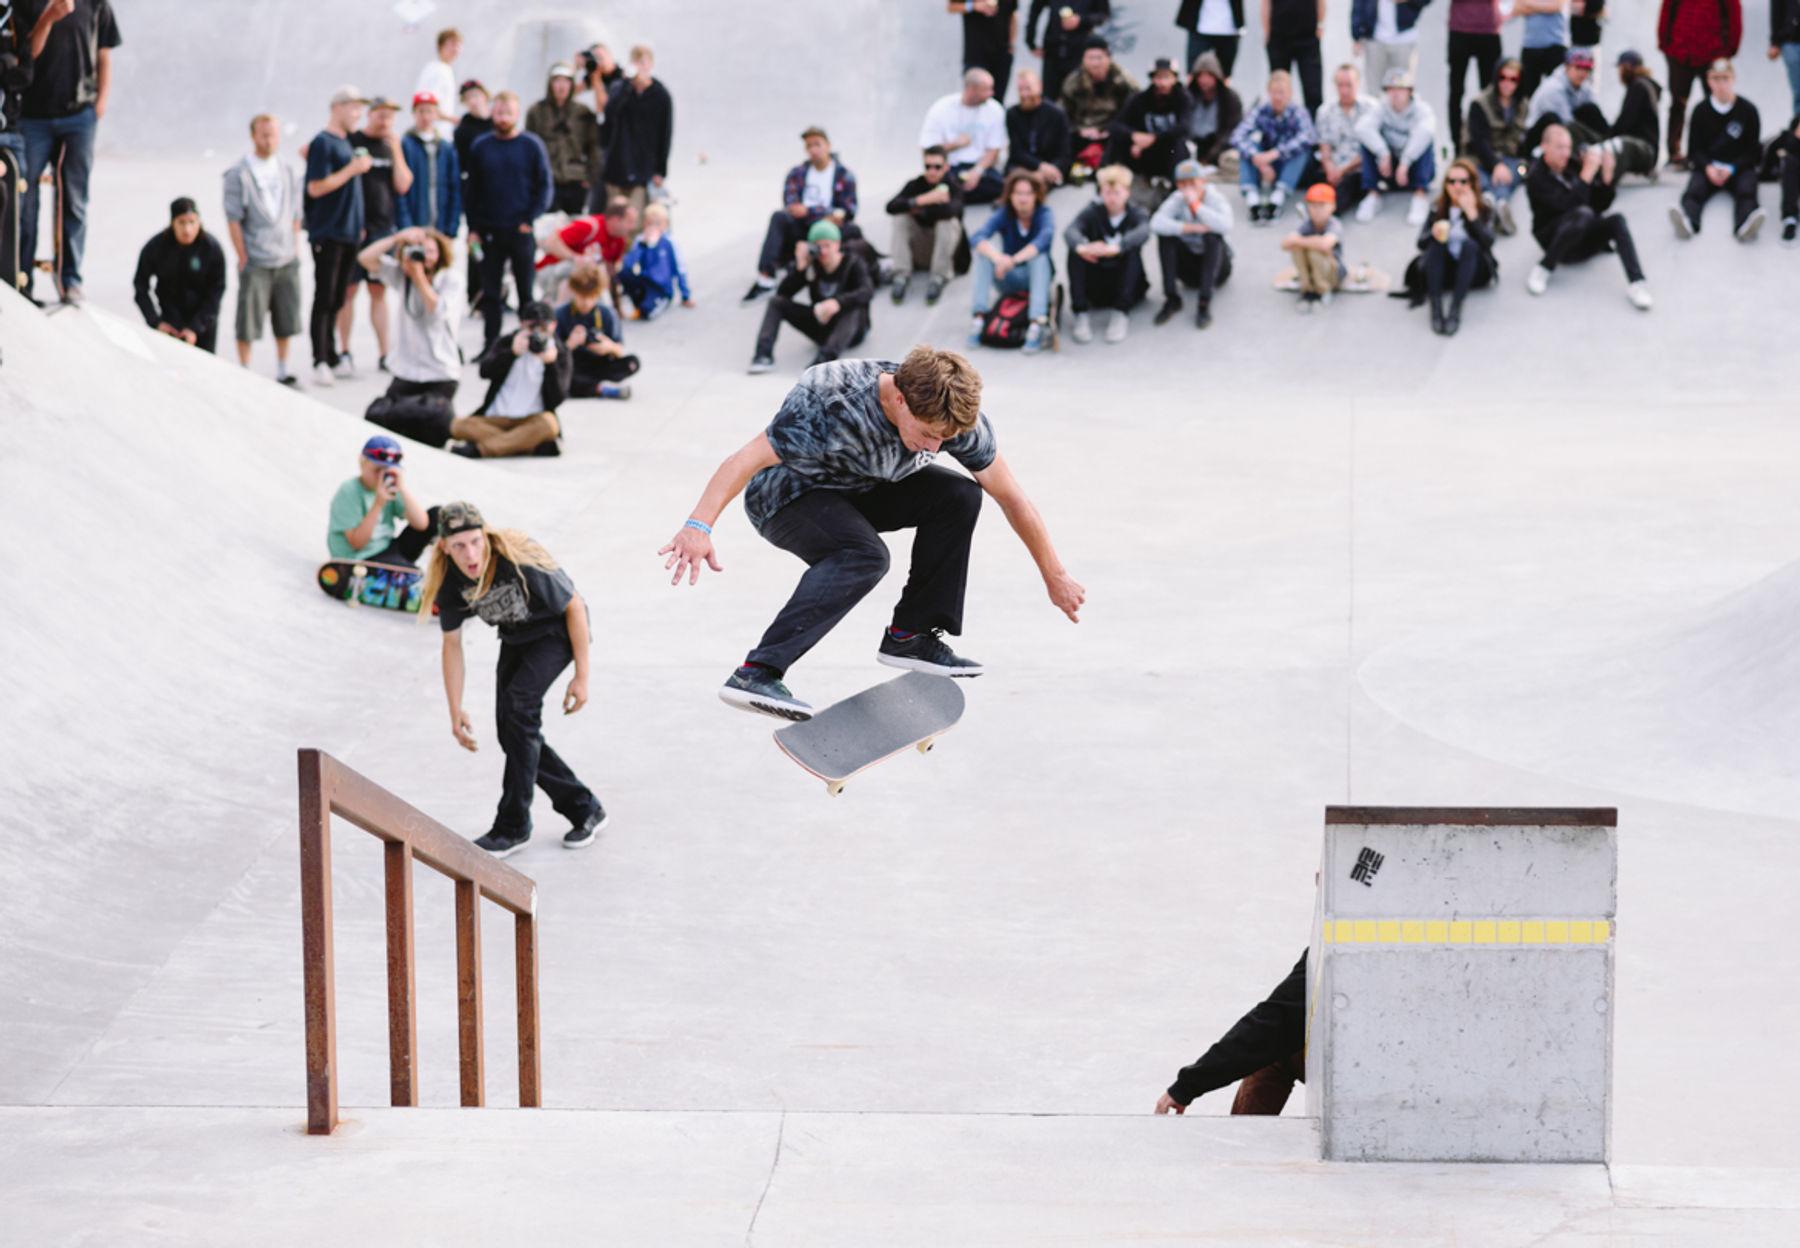 _IHC3223-Yoshi-Tanenbaum-Bs-360-Flip-Nike-SB-Copenhagen-Open-Day-1-Faelledparken-July-2015-Photographer-Maksim-Kalanep